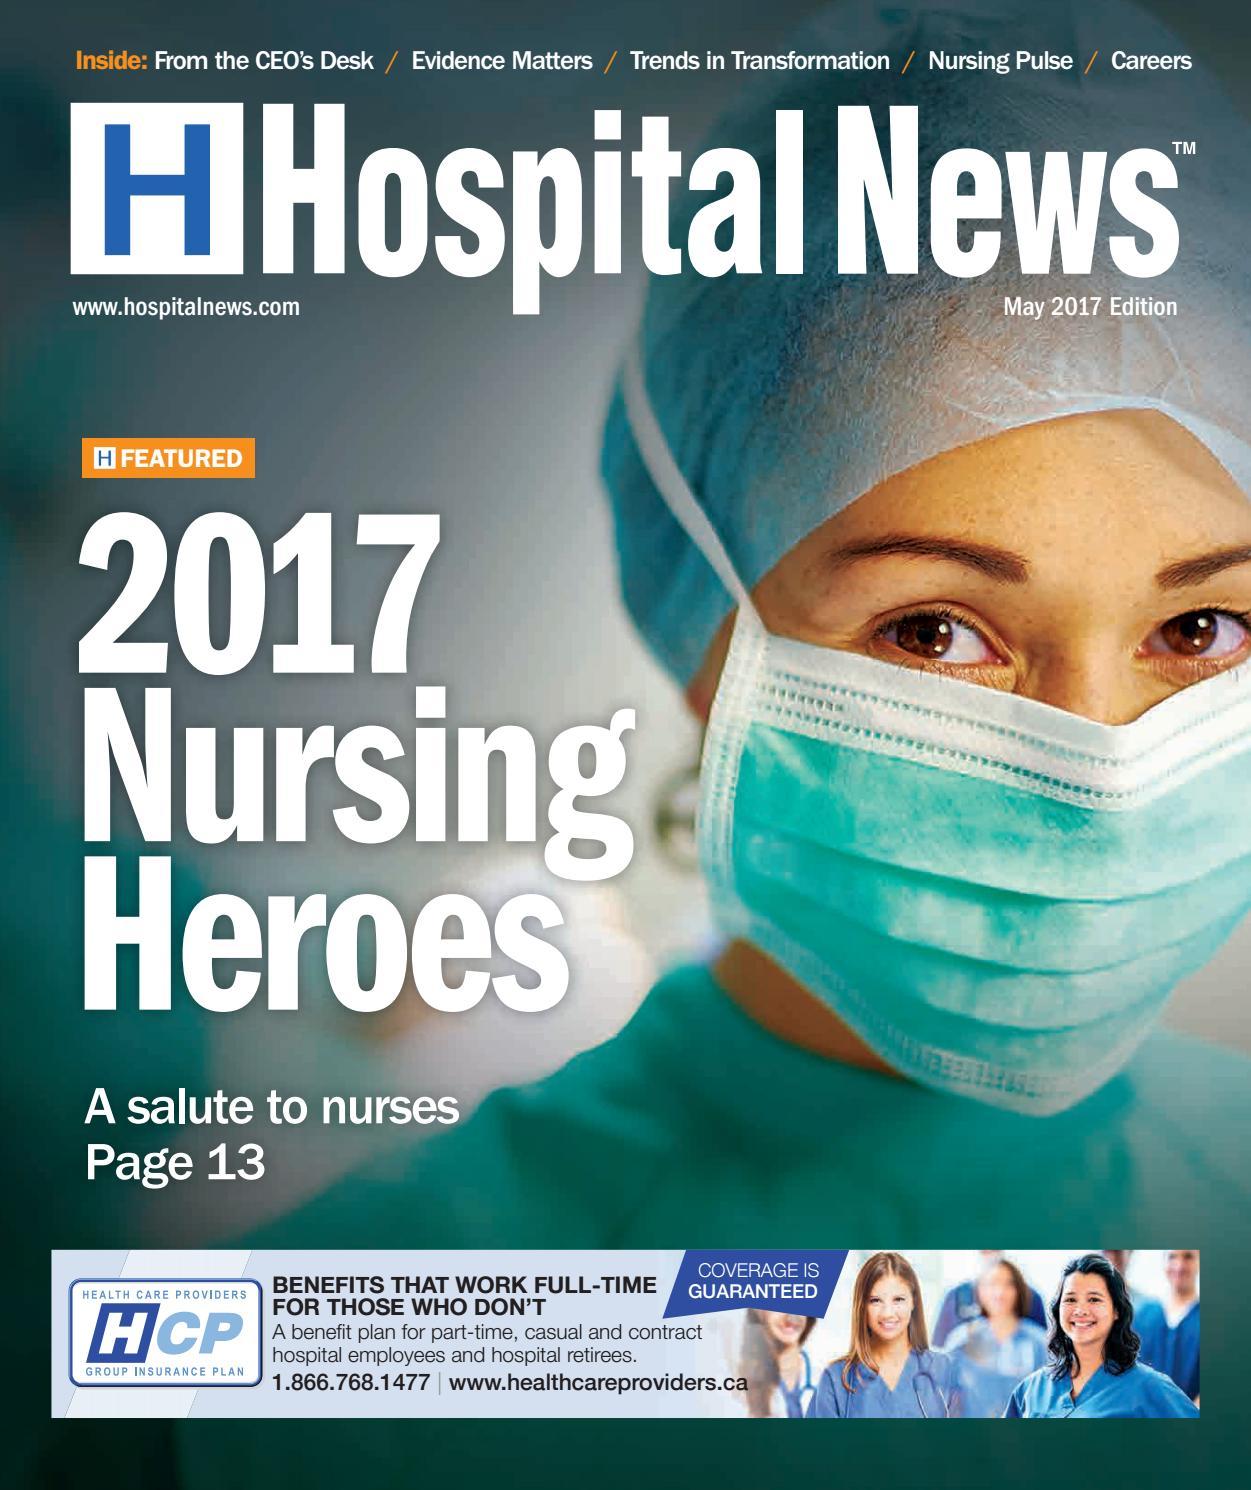 Hospital News 2017 May Edition by Hospital News - issuu